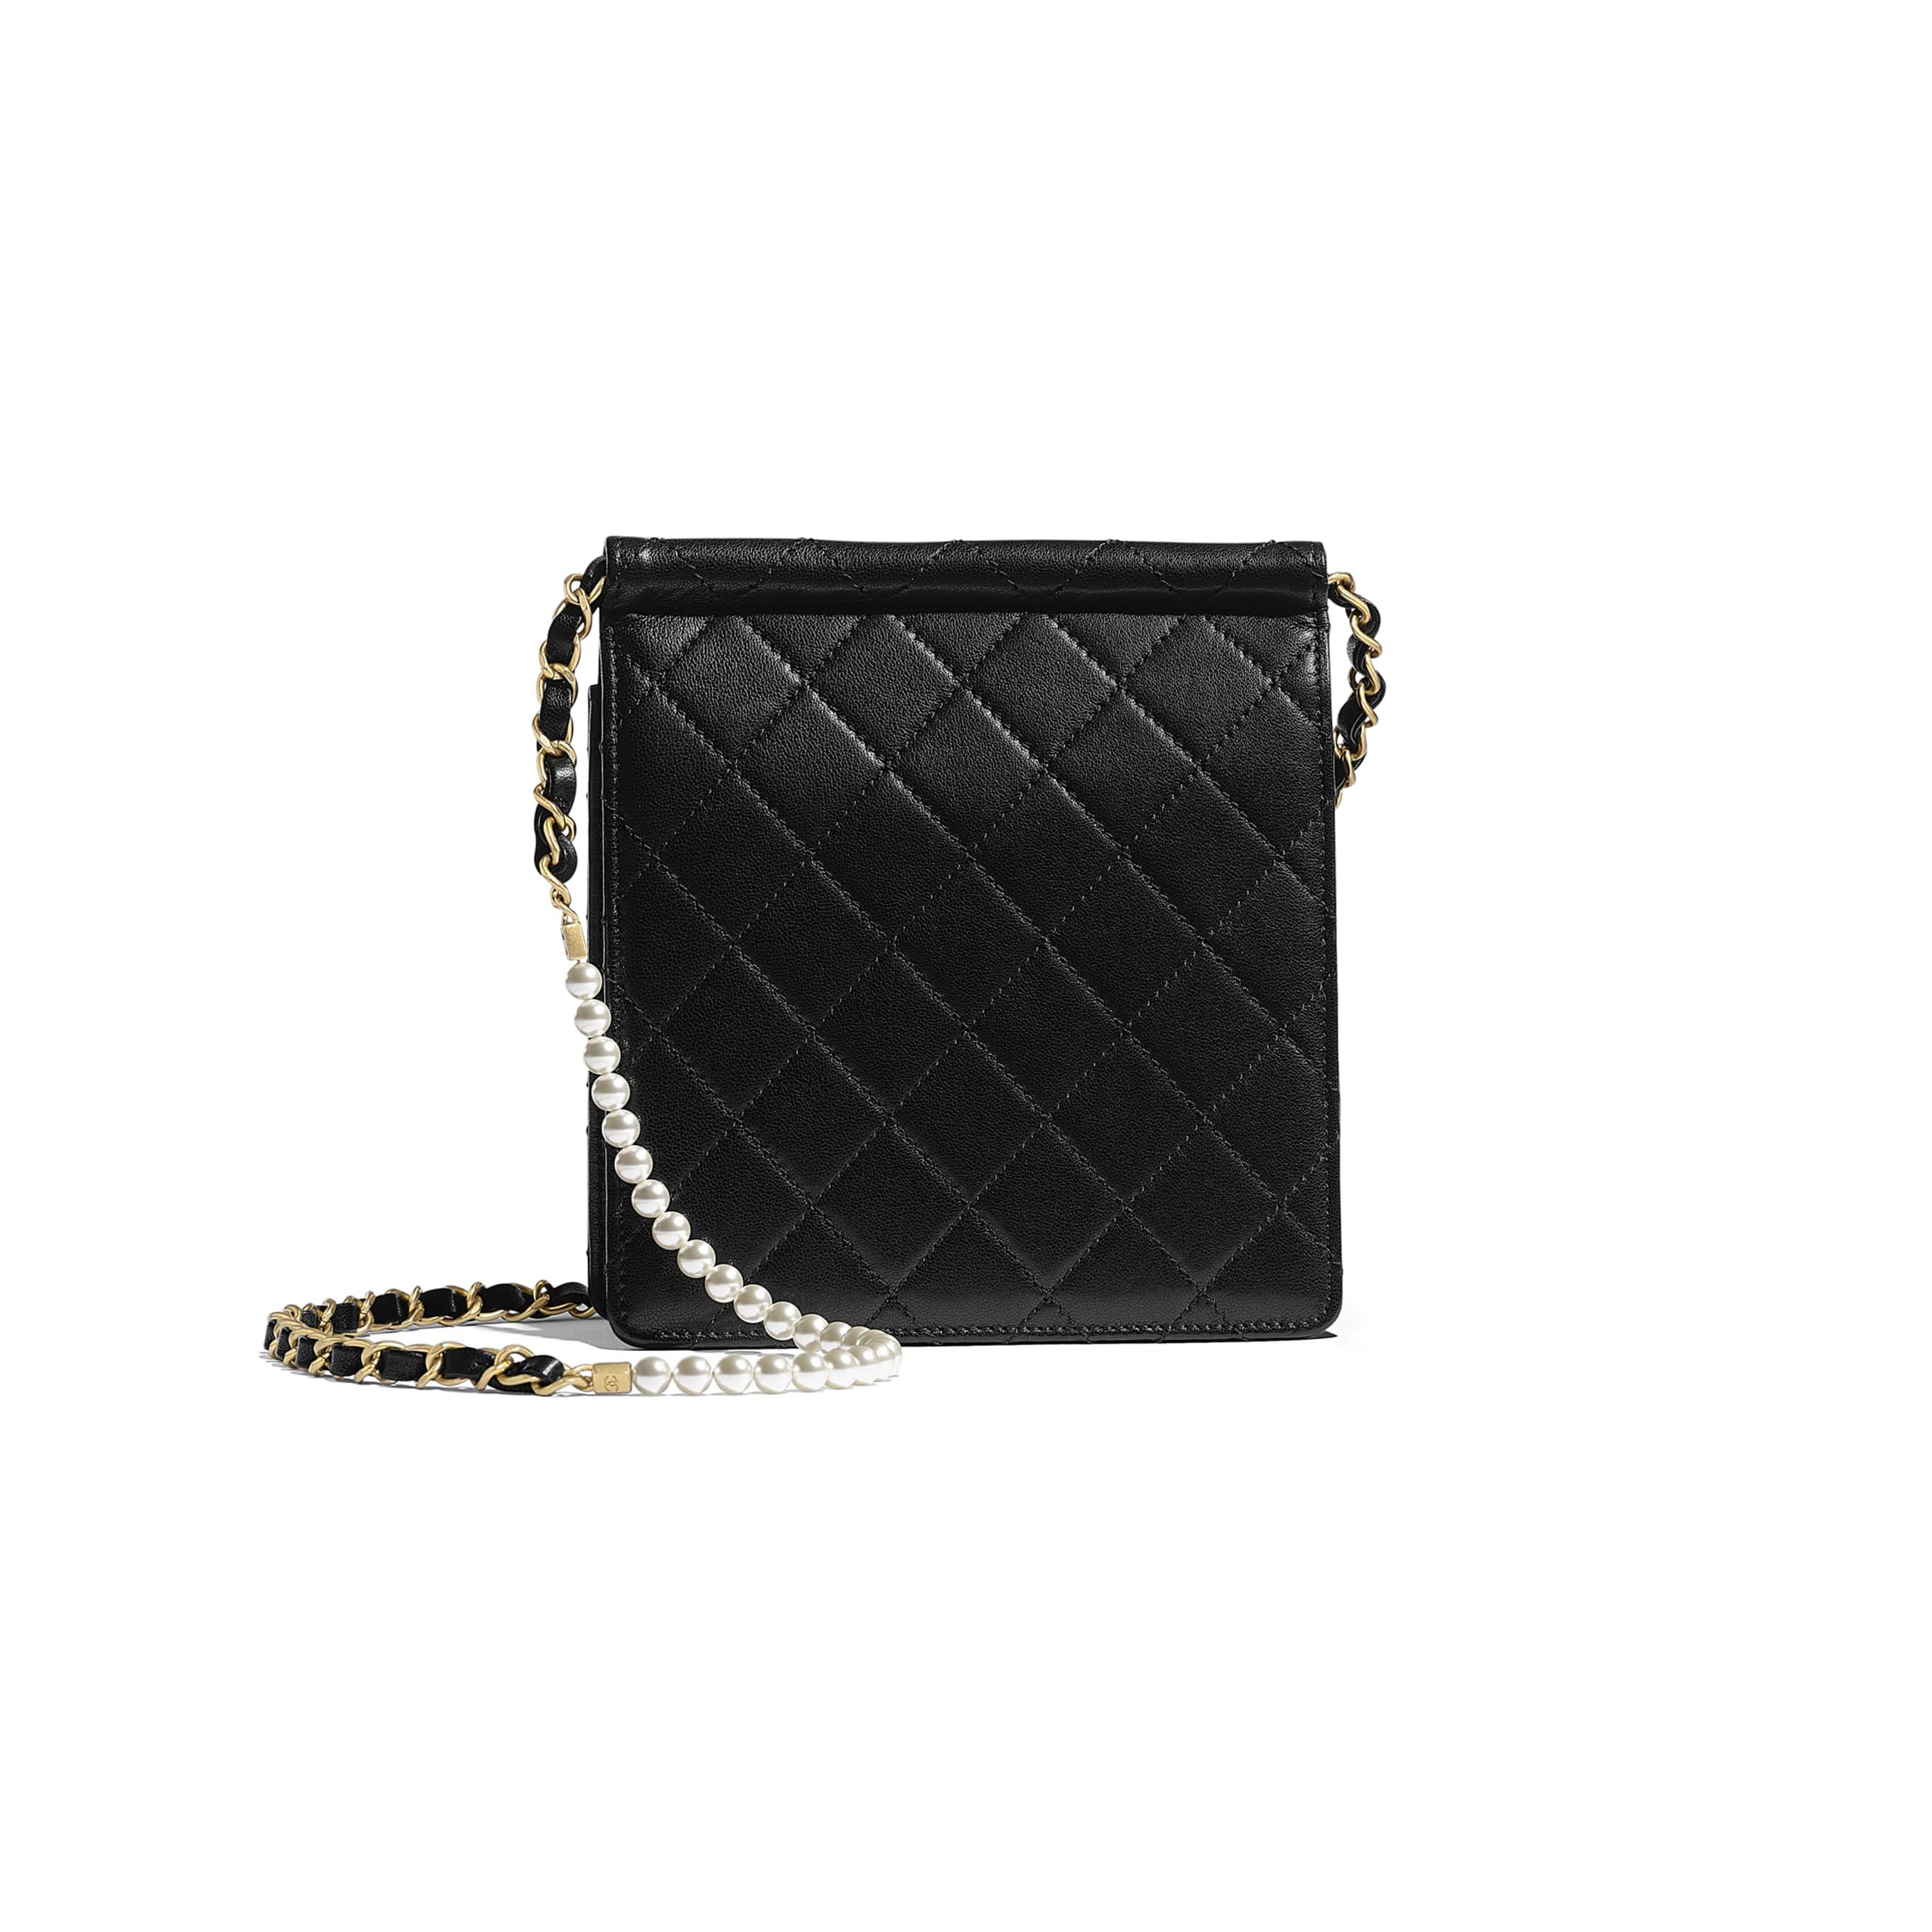 Flap Bag - Black - Lambskin, Imitation Pearls & Gold-Tone Metal - Alternative view - see standard sized version